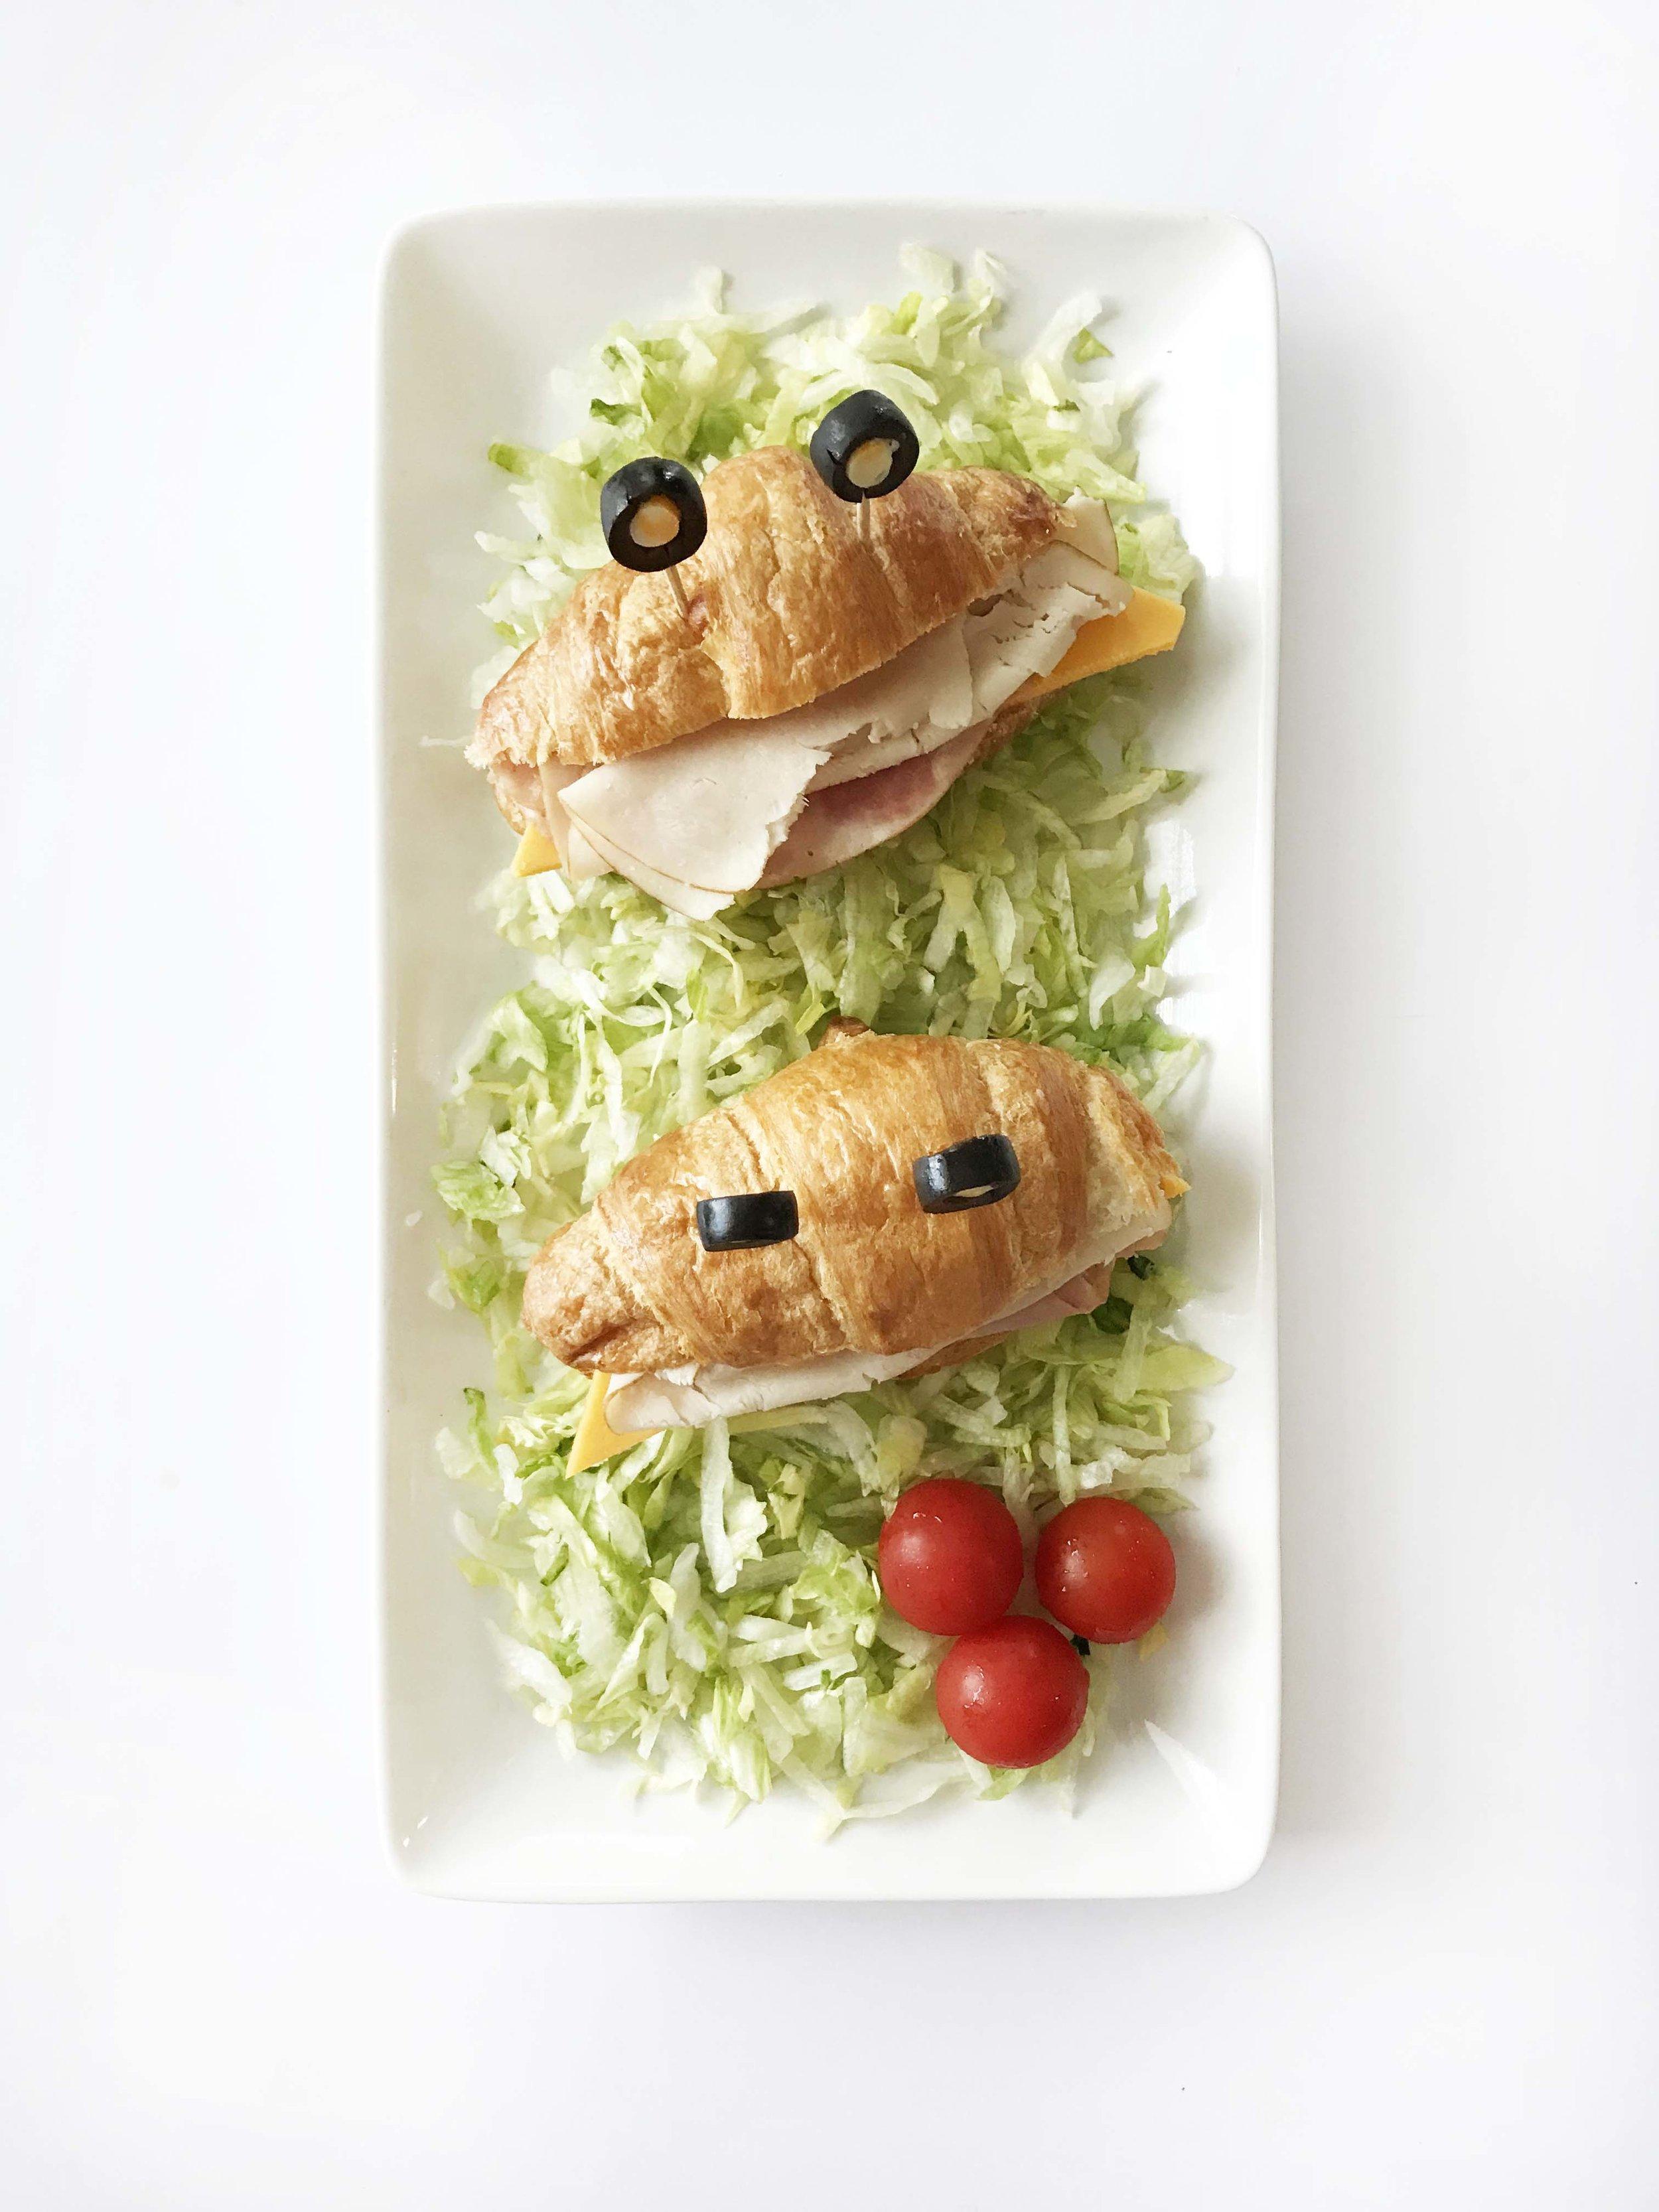 crabby-sandwich3.jpg